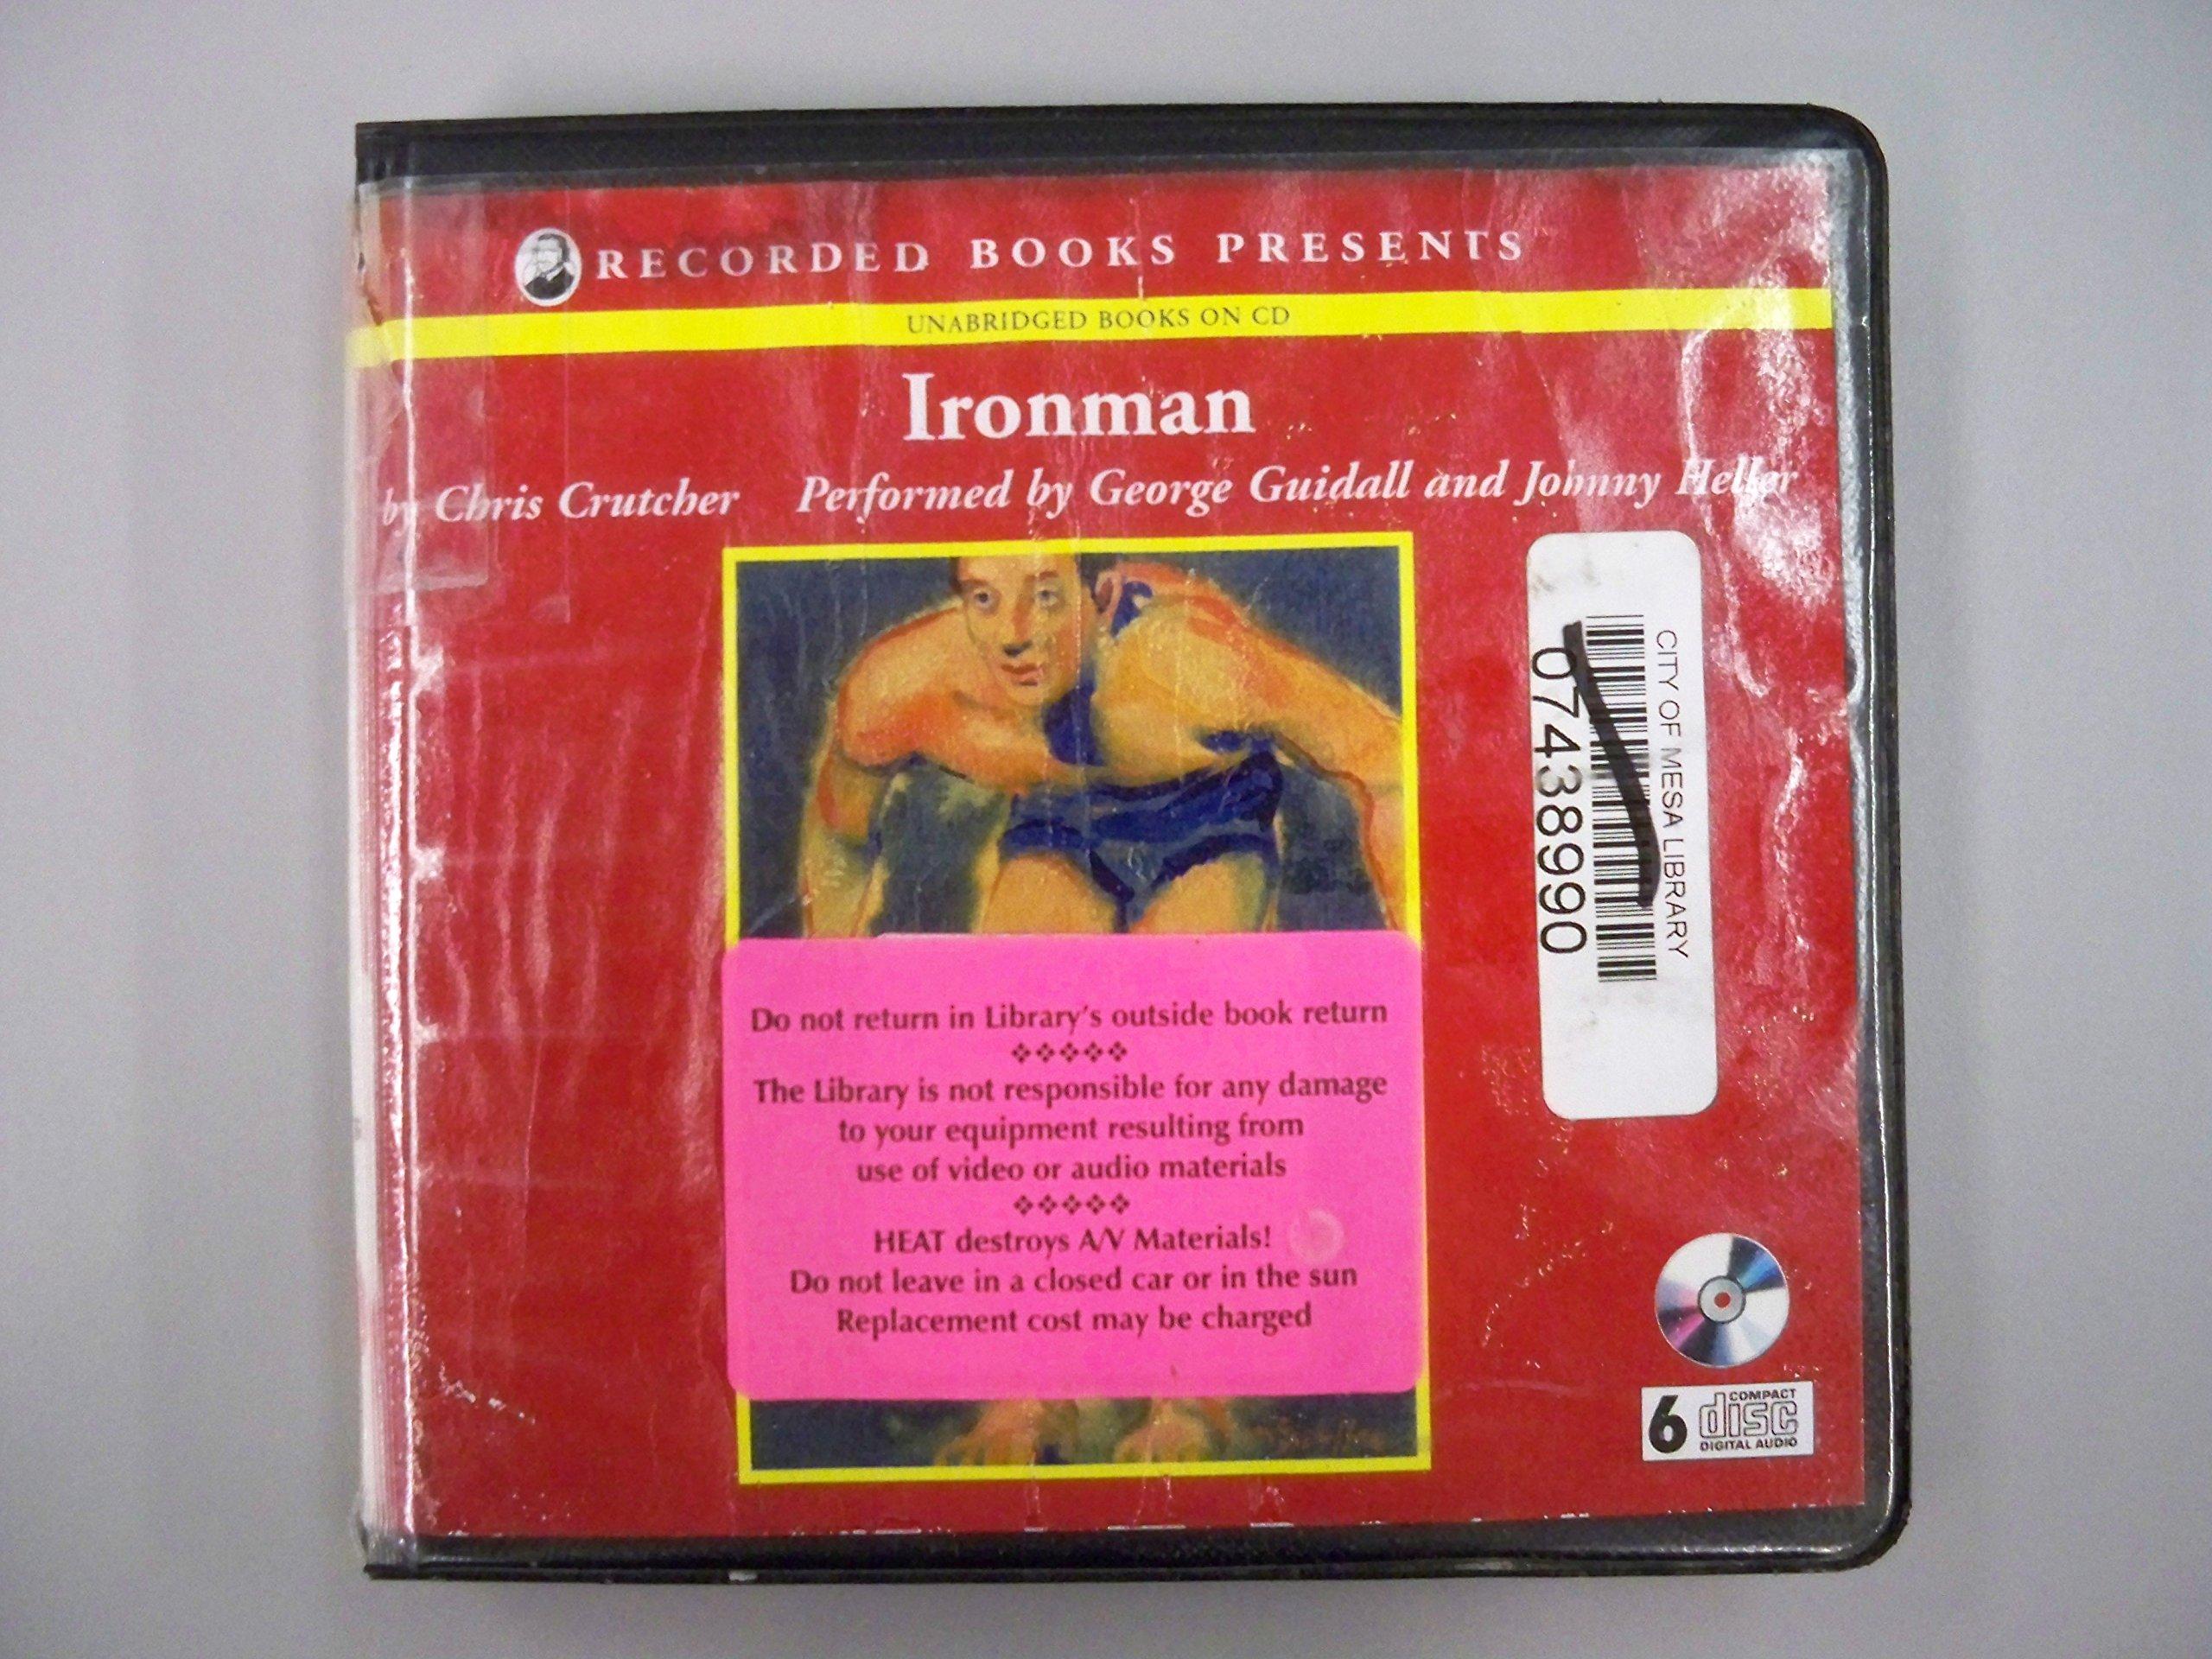 ironman chris crutcher characters